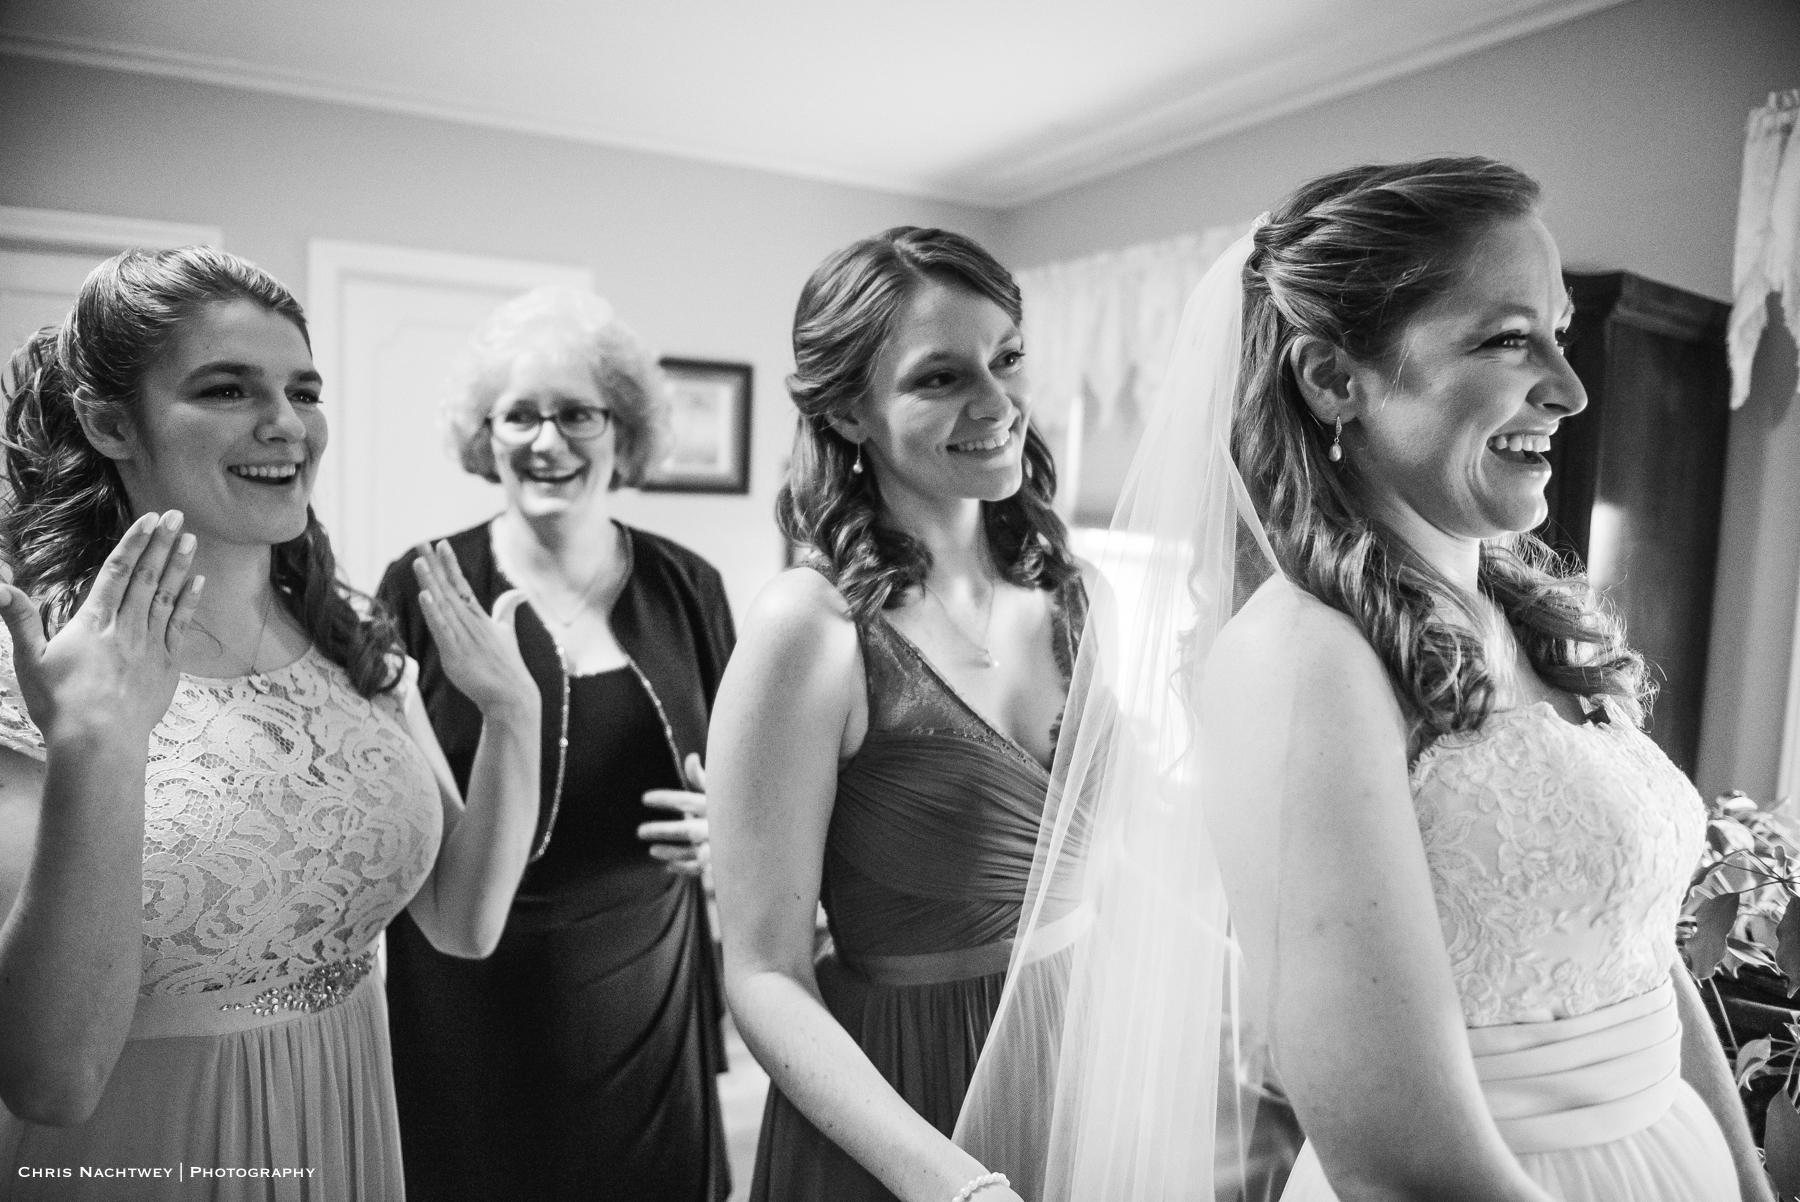 wedding-the-litchfield-inn-ct-photos-chris-nachtwey-photography-2018-12.jpg